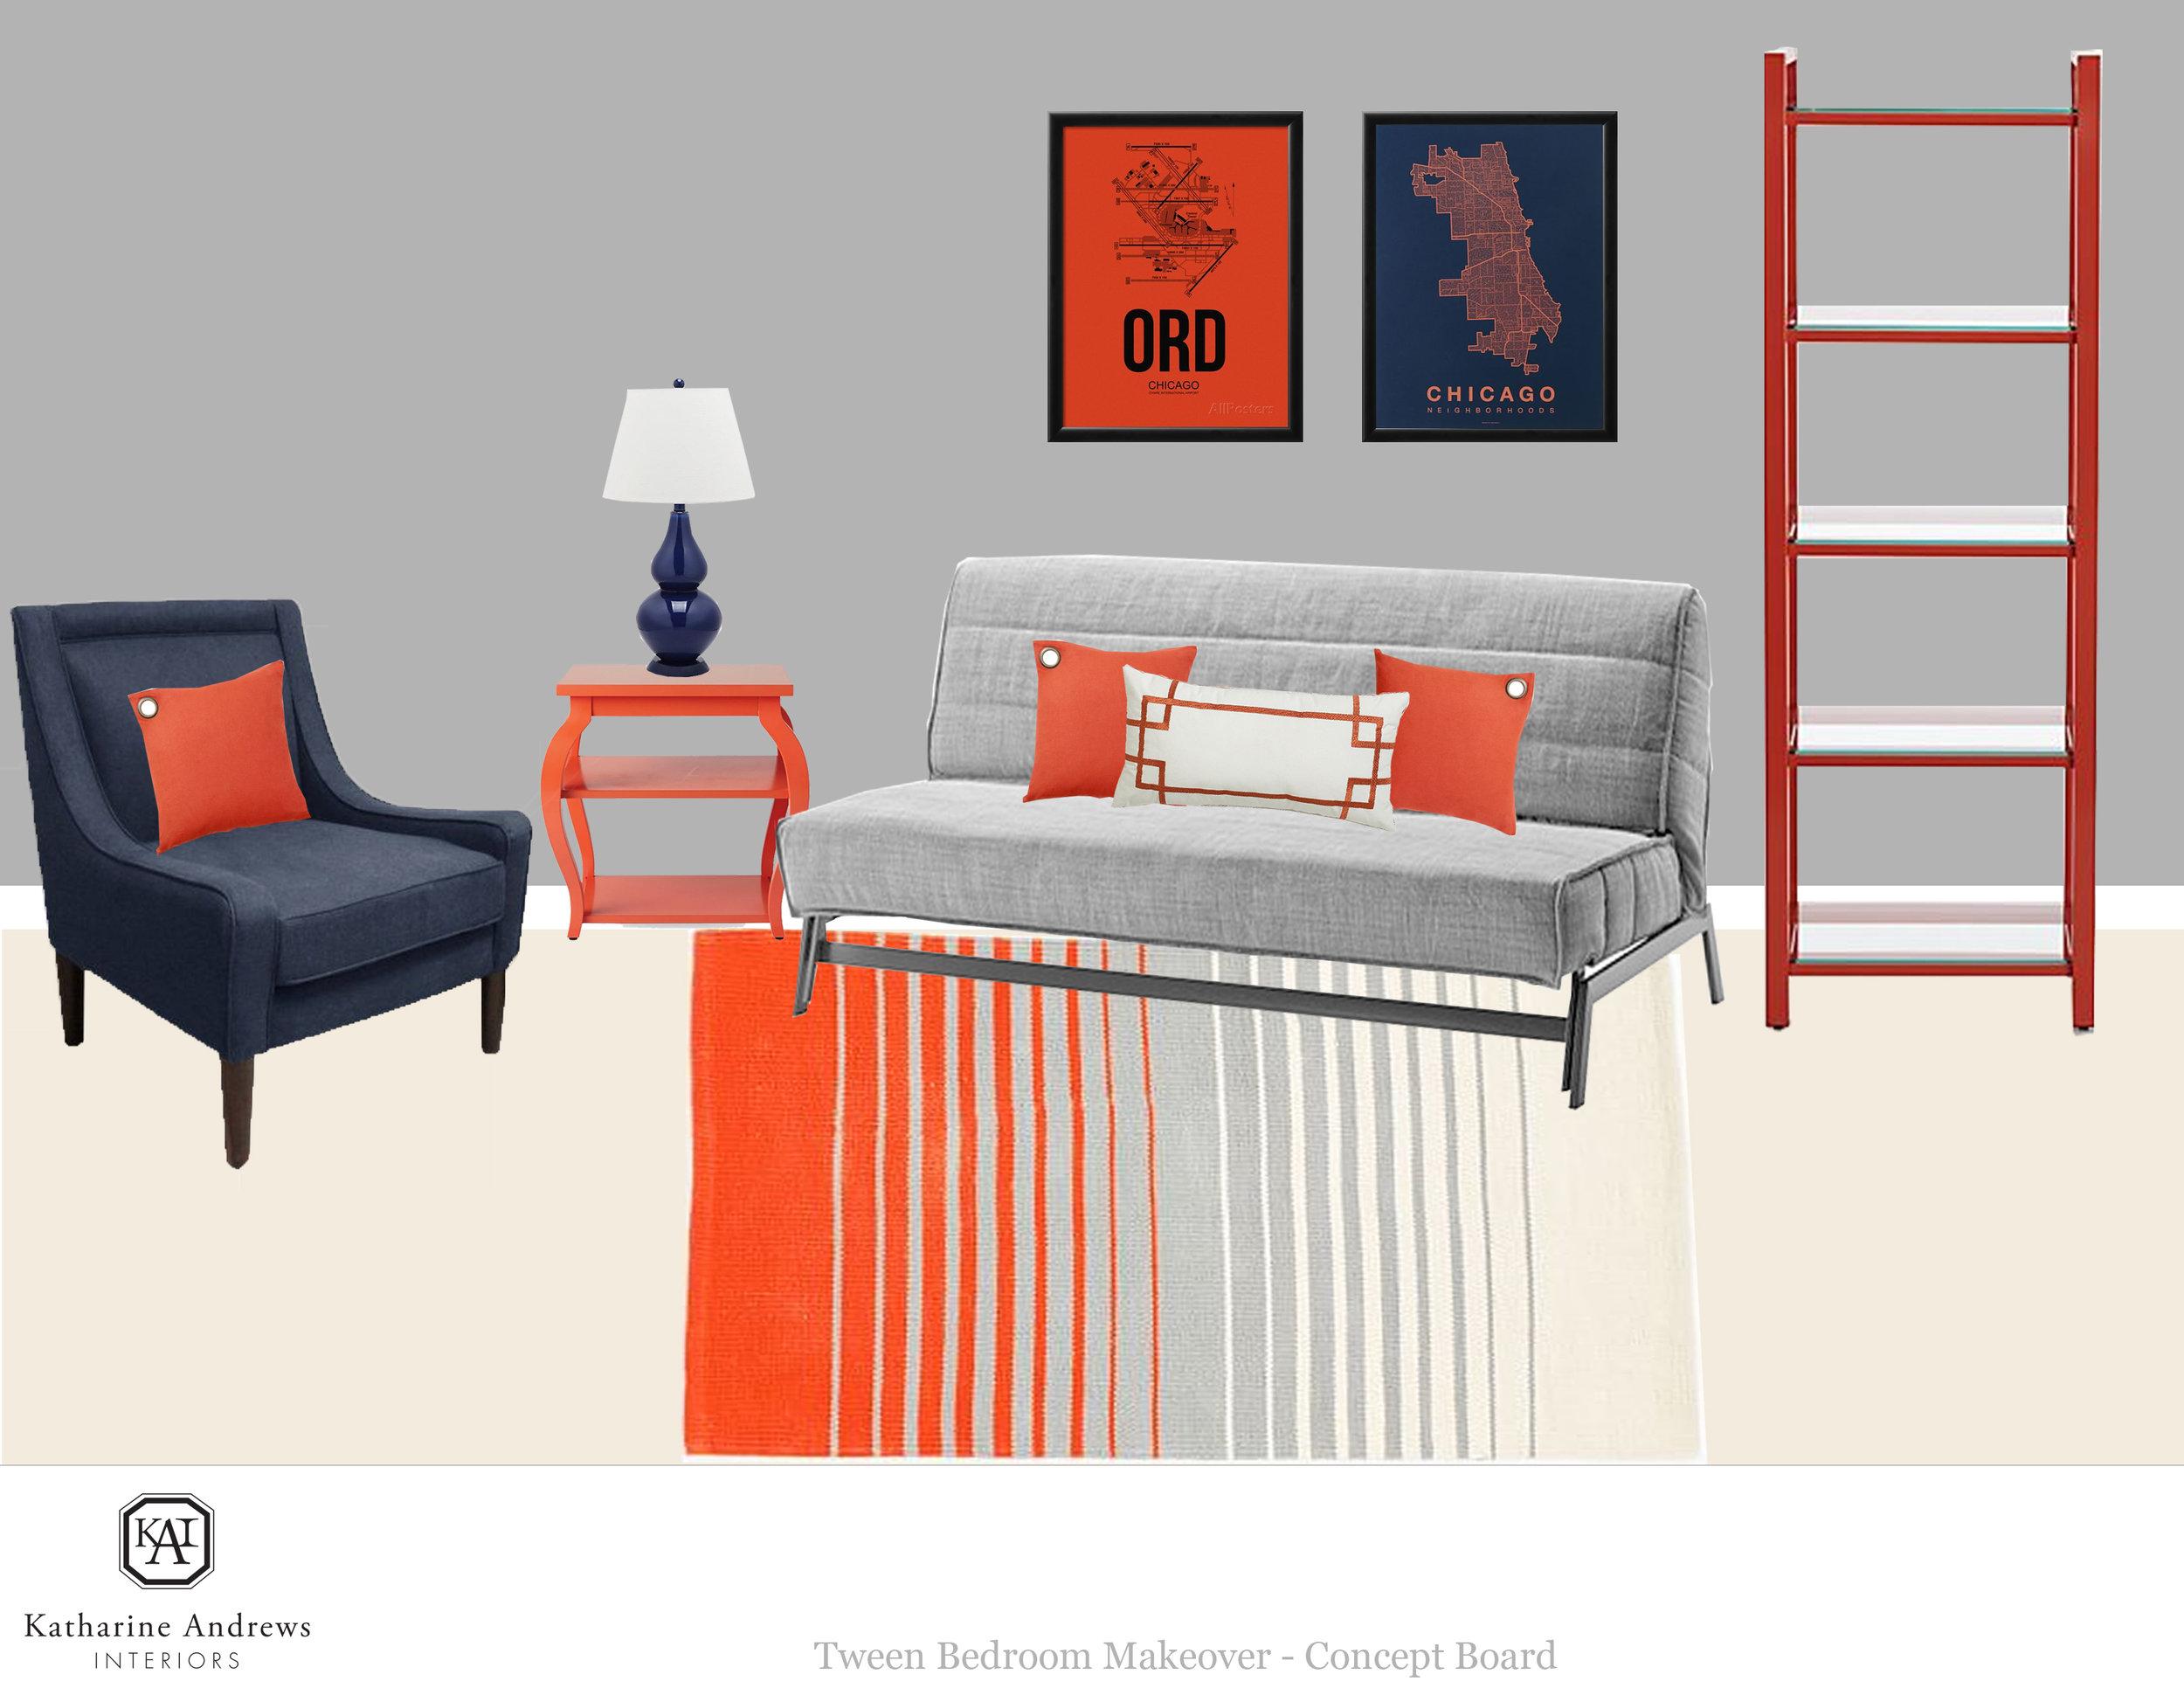 VANEK_INSPIRATION BOARD_FUTON WALL W NAVY CHAIR AND ORANGE SIDE TABLE.jpg